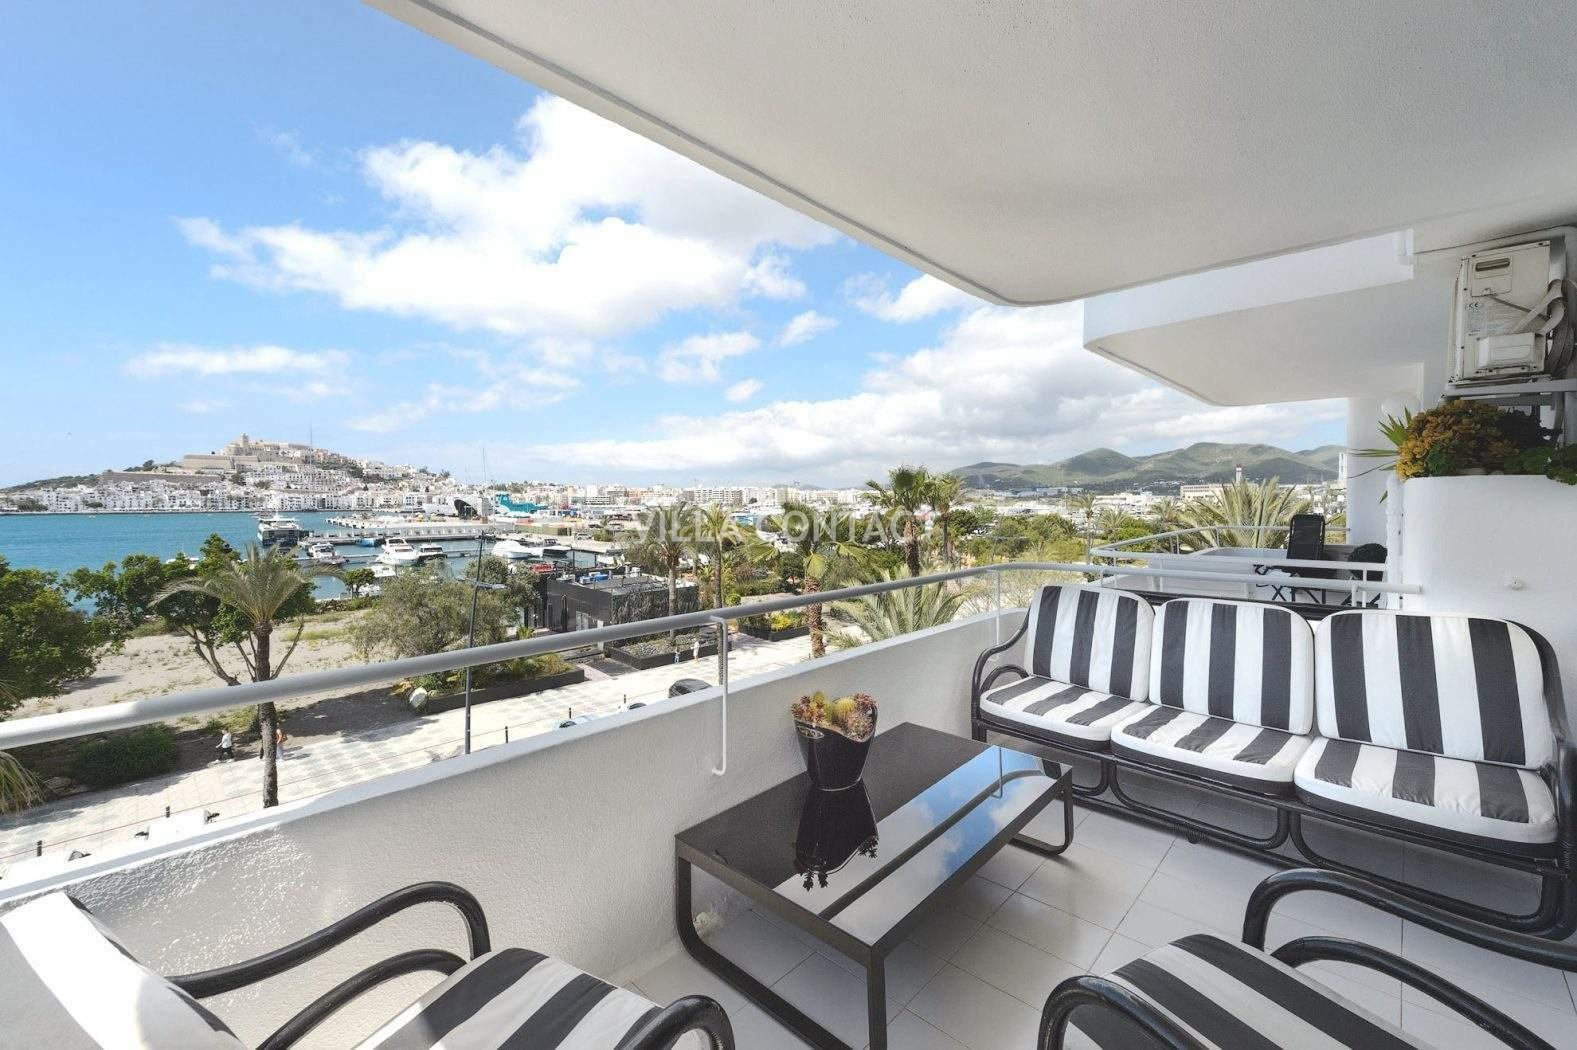 Apartment in Ibiza, Balearic Islands, Spain 1 - 11498717